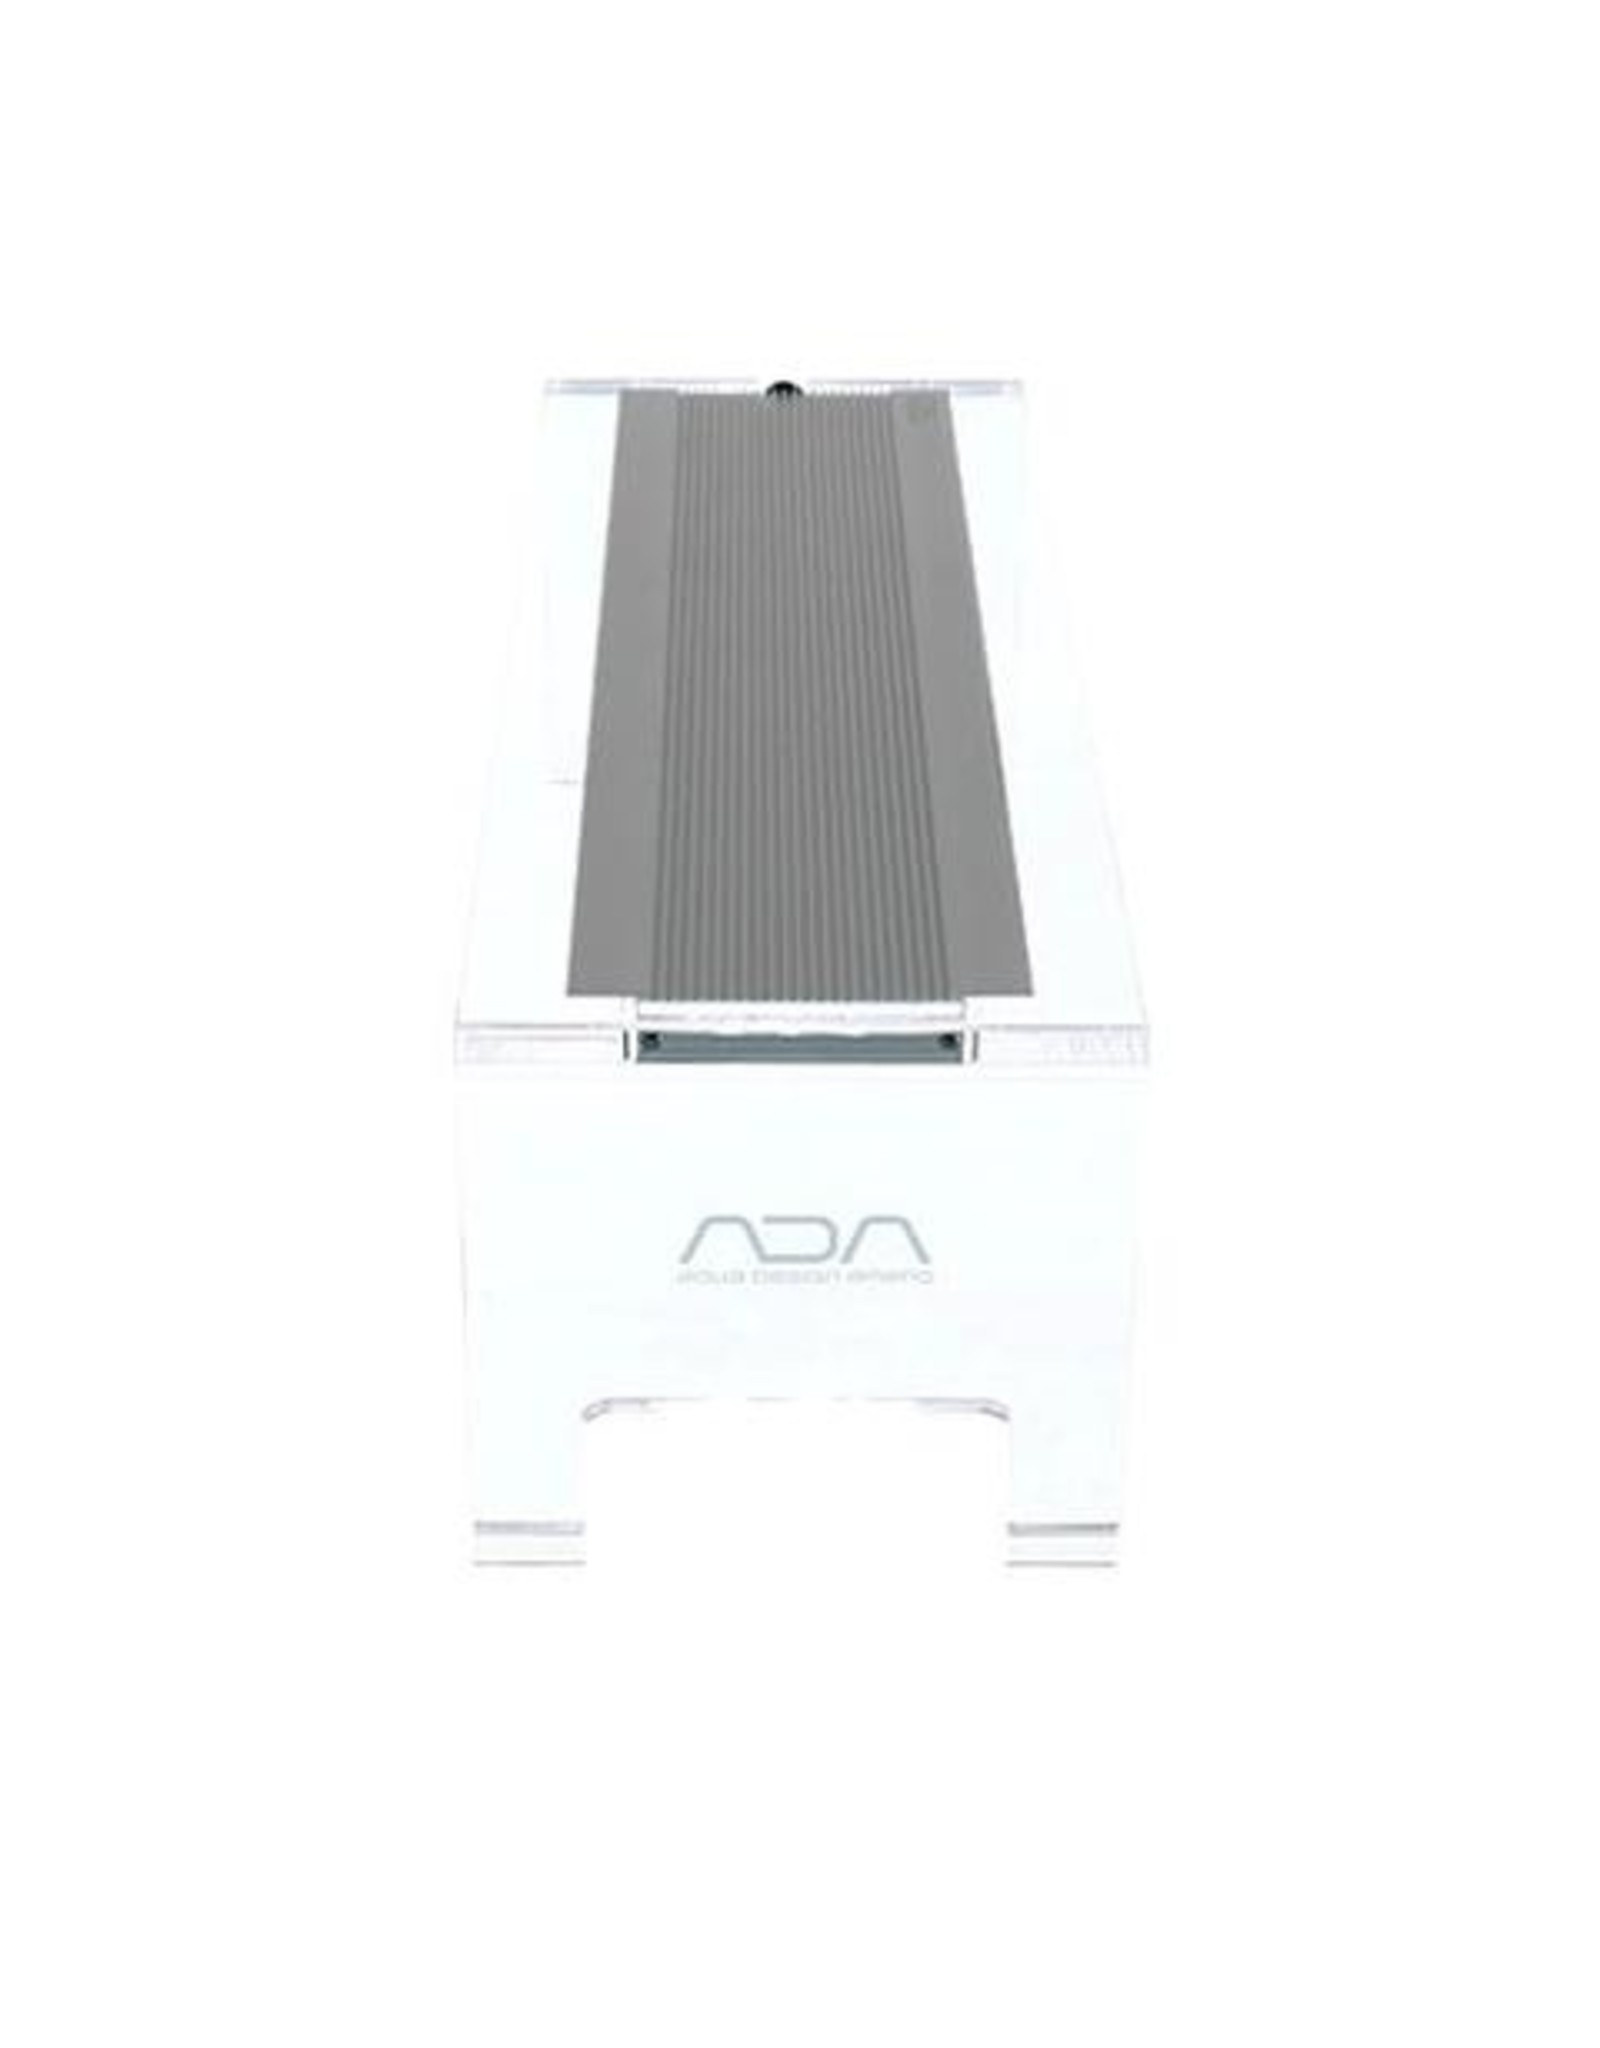 ADA ADA Aquasky G601